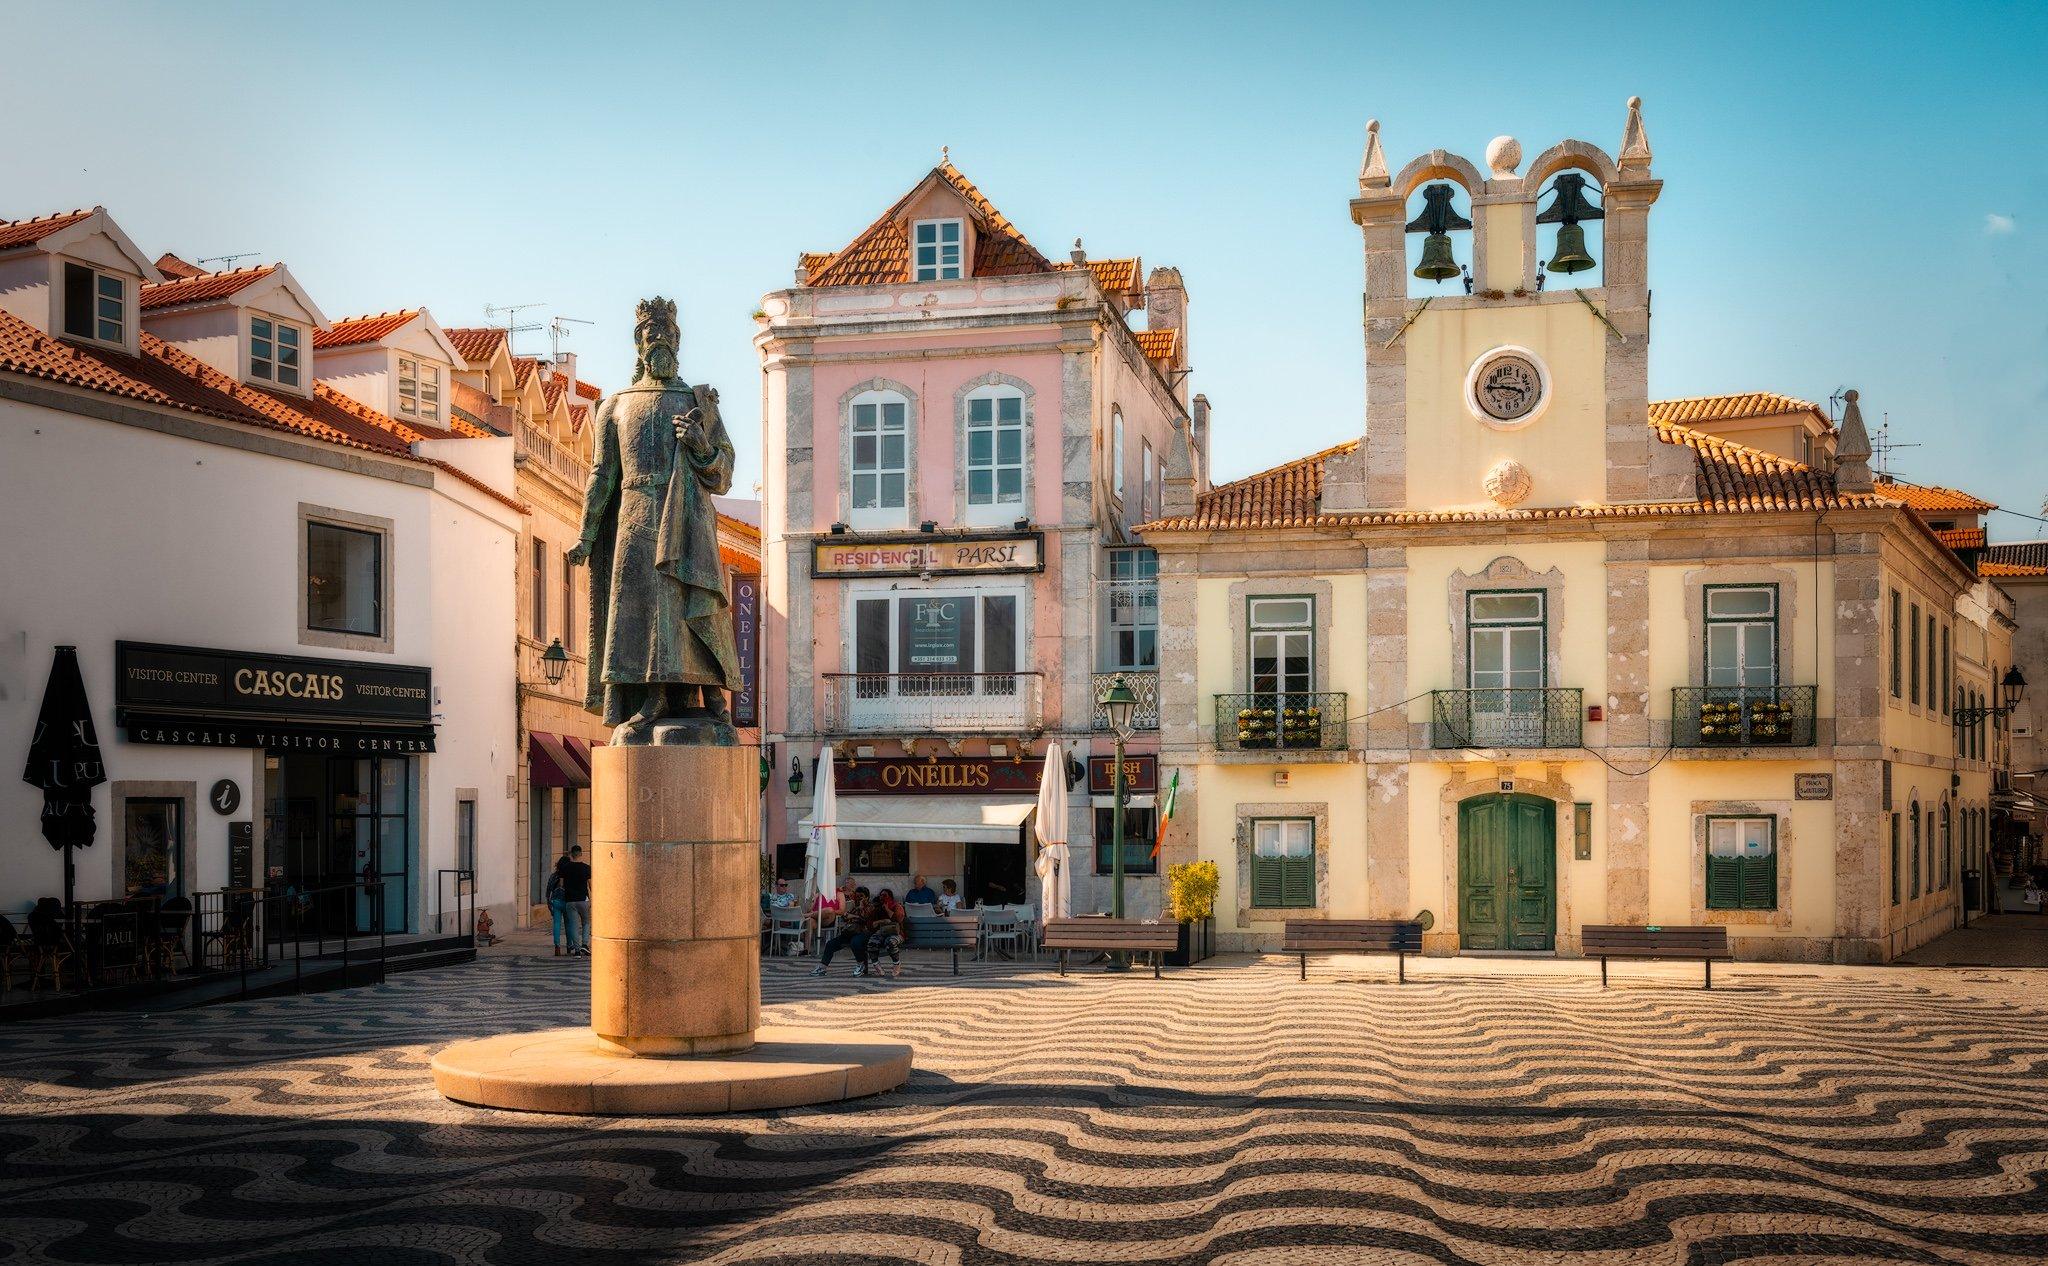 Cascais Stadtzentrum - Der Platz des 5. Oktober; Portugal.